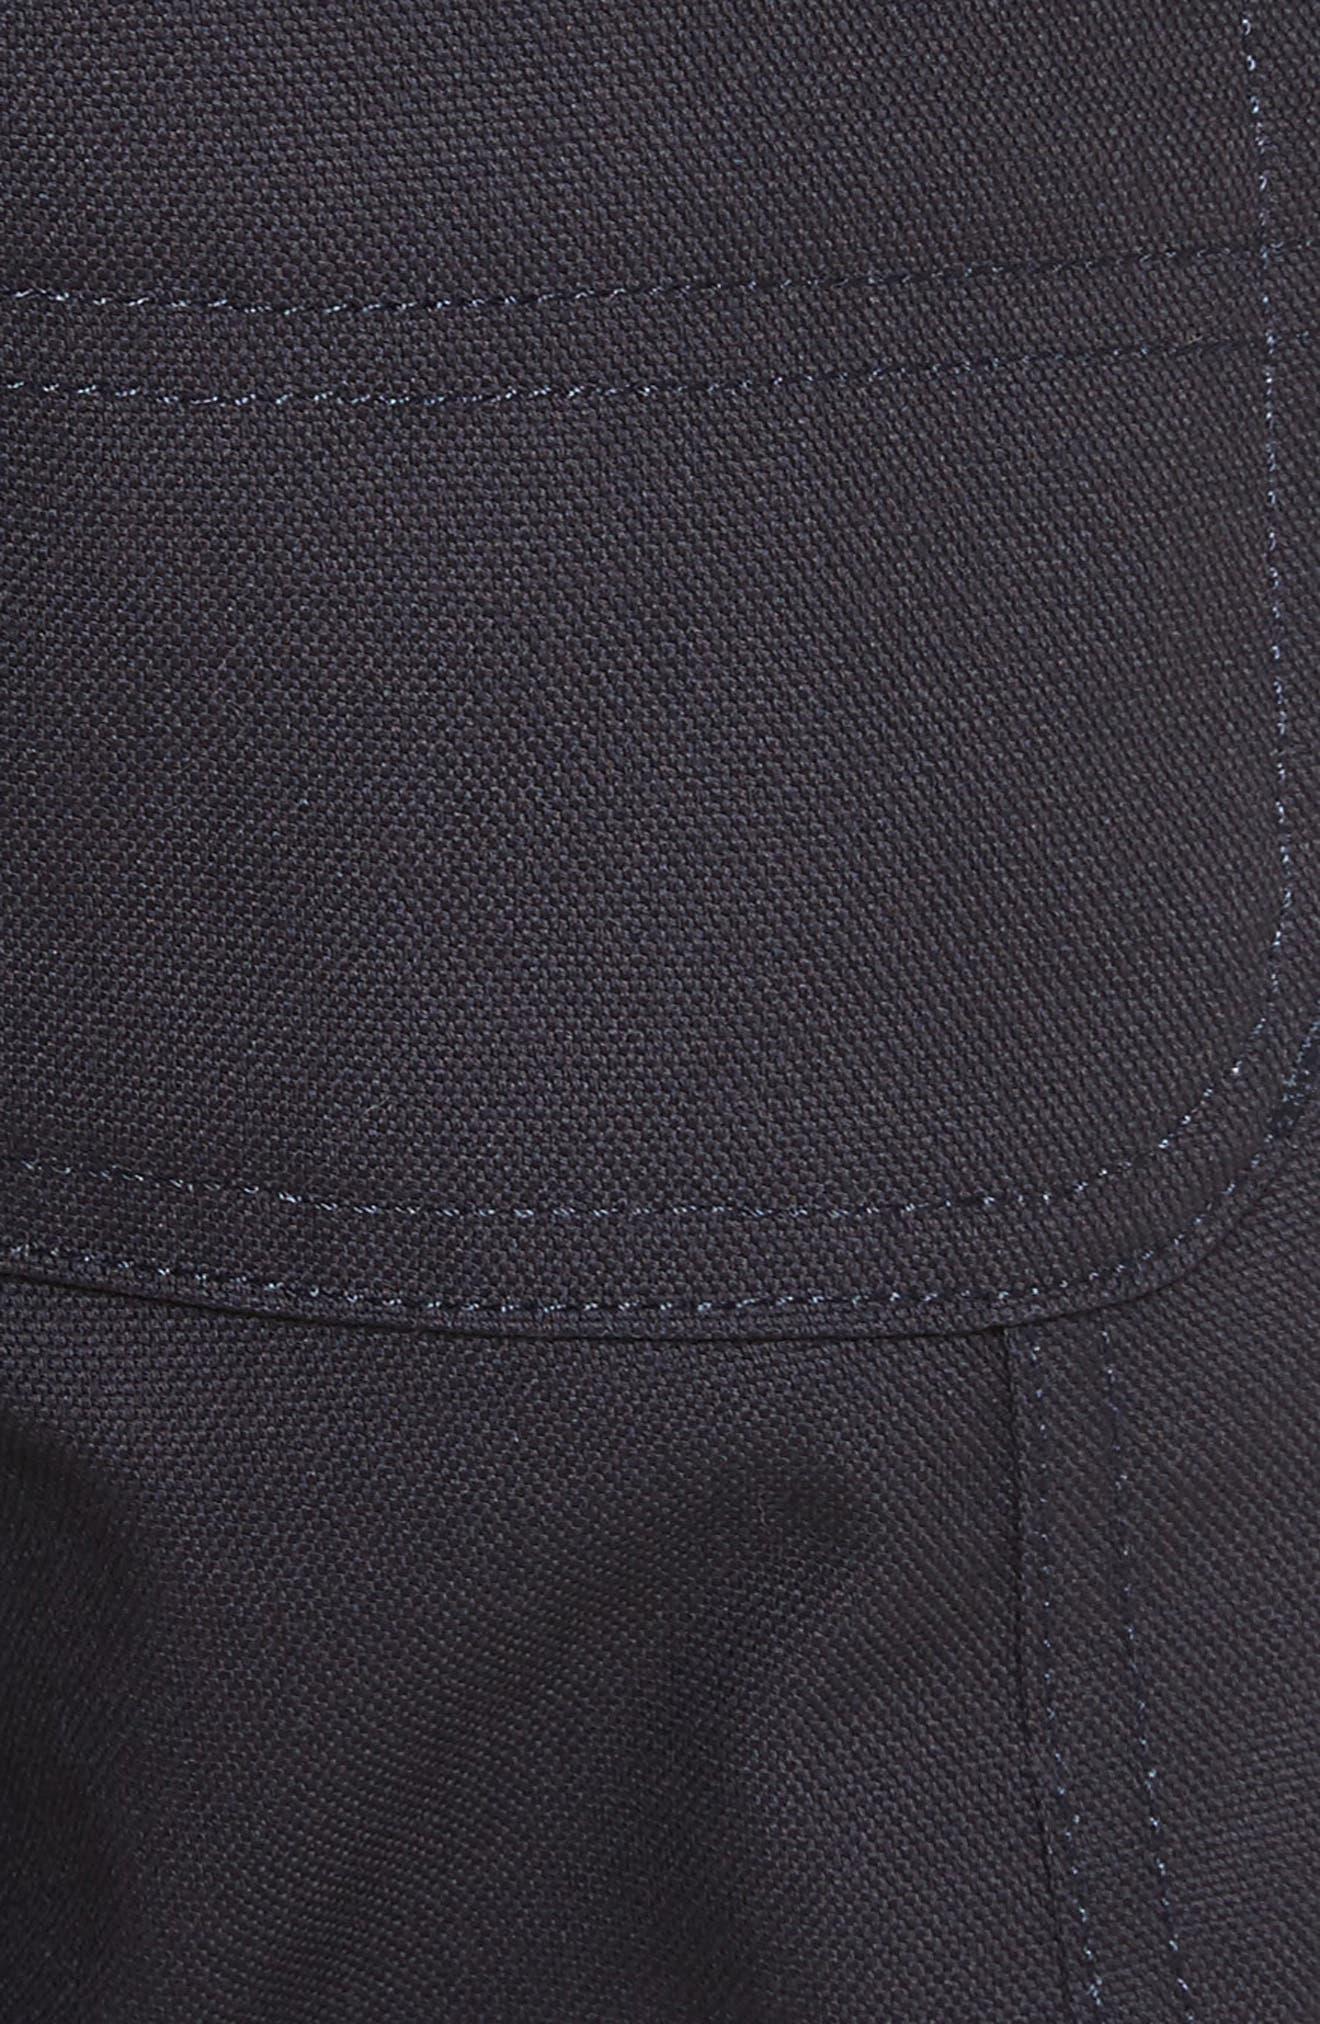 Ruck Double Knee Canvas Pants,                             Alternate thumbnail 5, color,                             Dark Navy